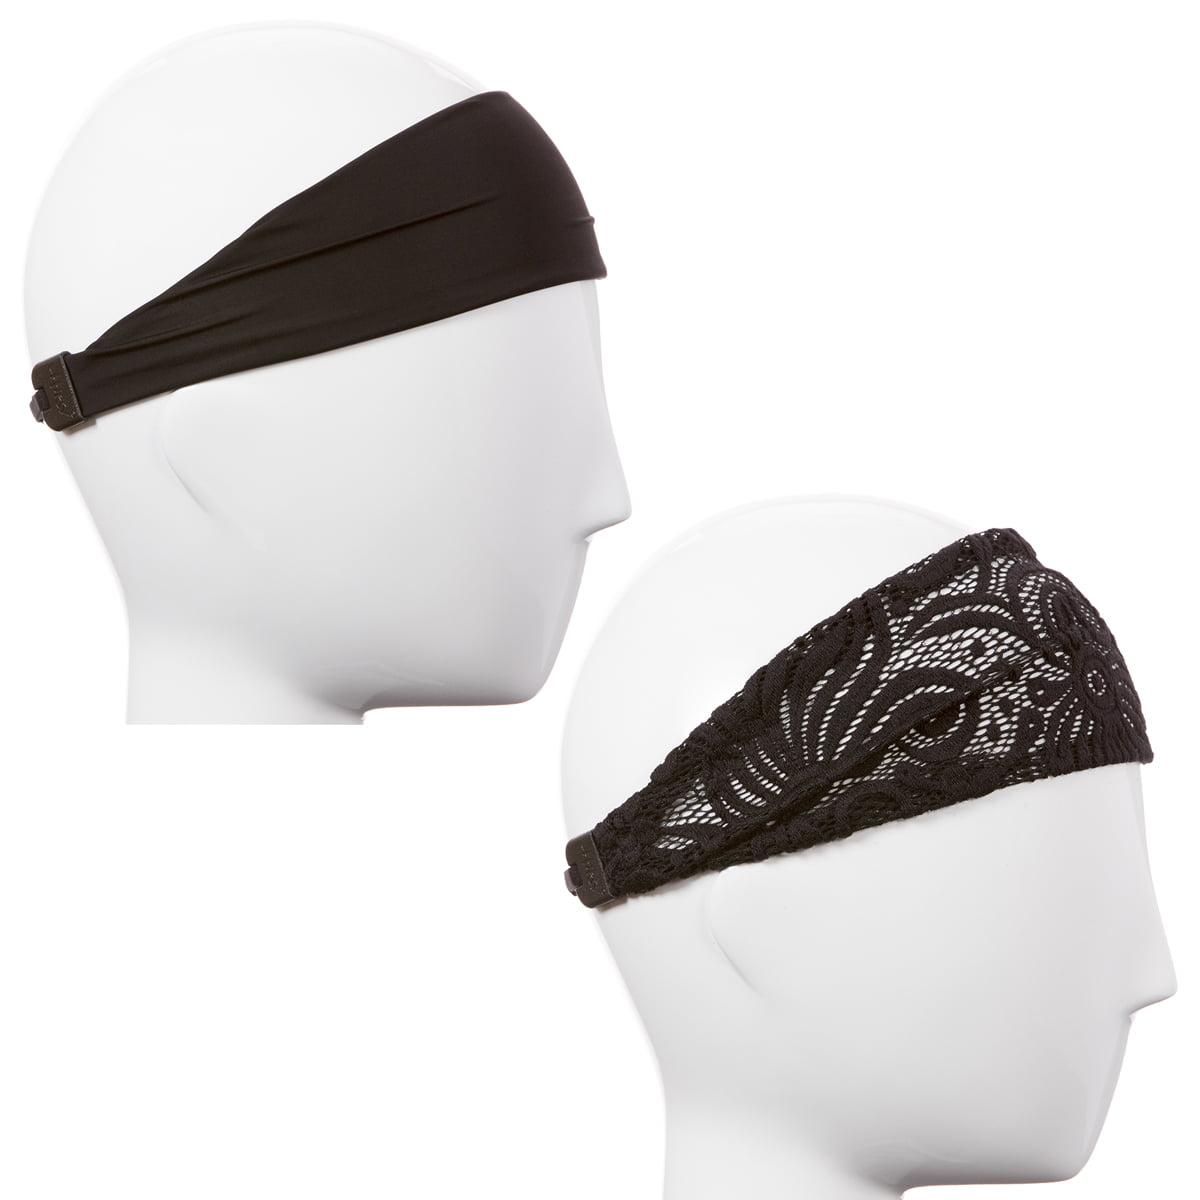 Hipsy Women's Adjustable & Stretchy Xflex Band Fashion Lace Headband 2pk (Black & Black)